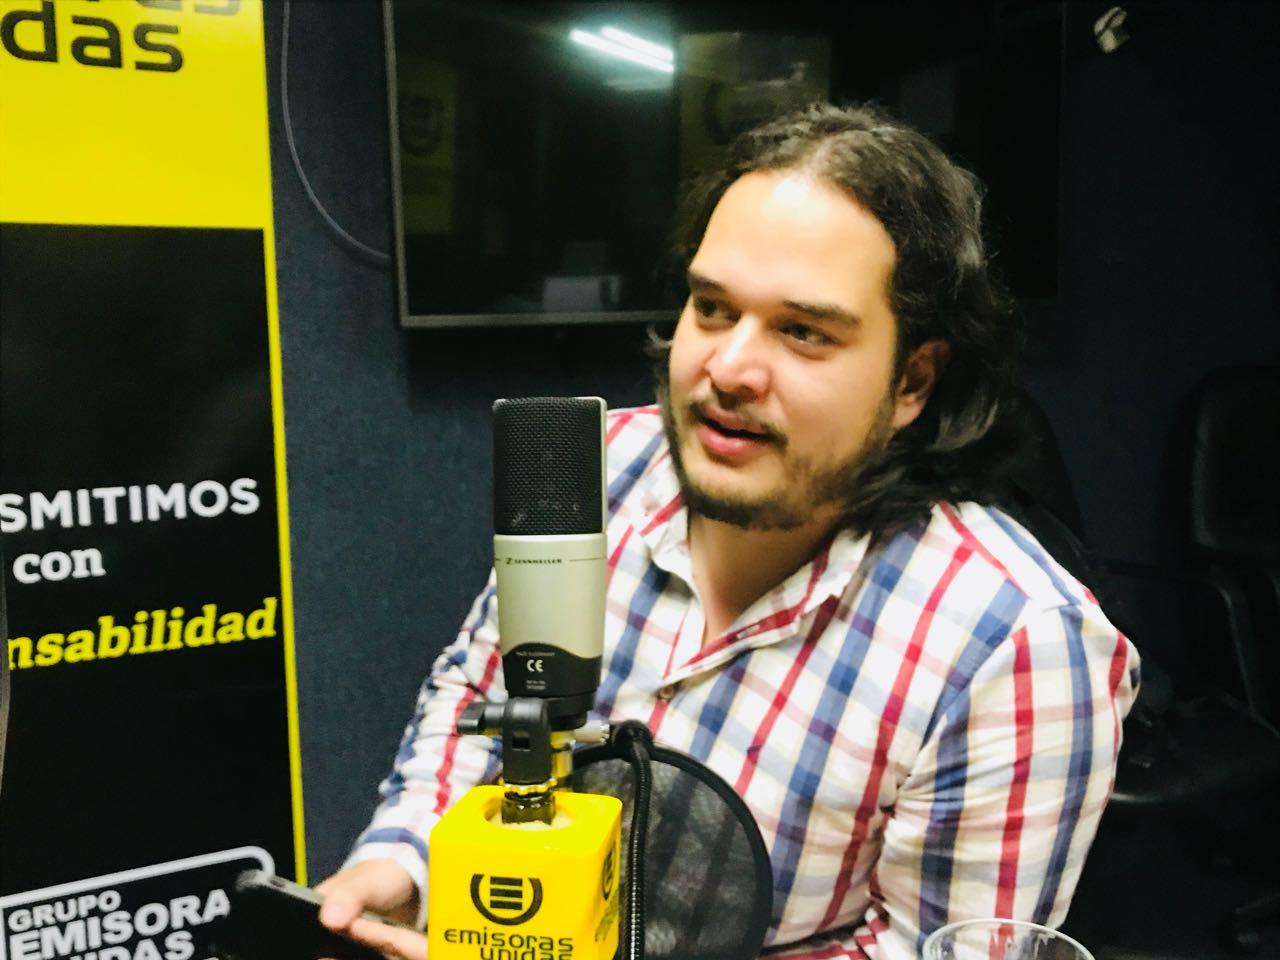 Principio de la neutralidad EU Guatemala Emisoras Unidas